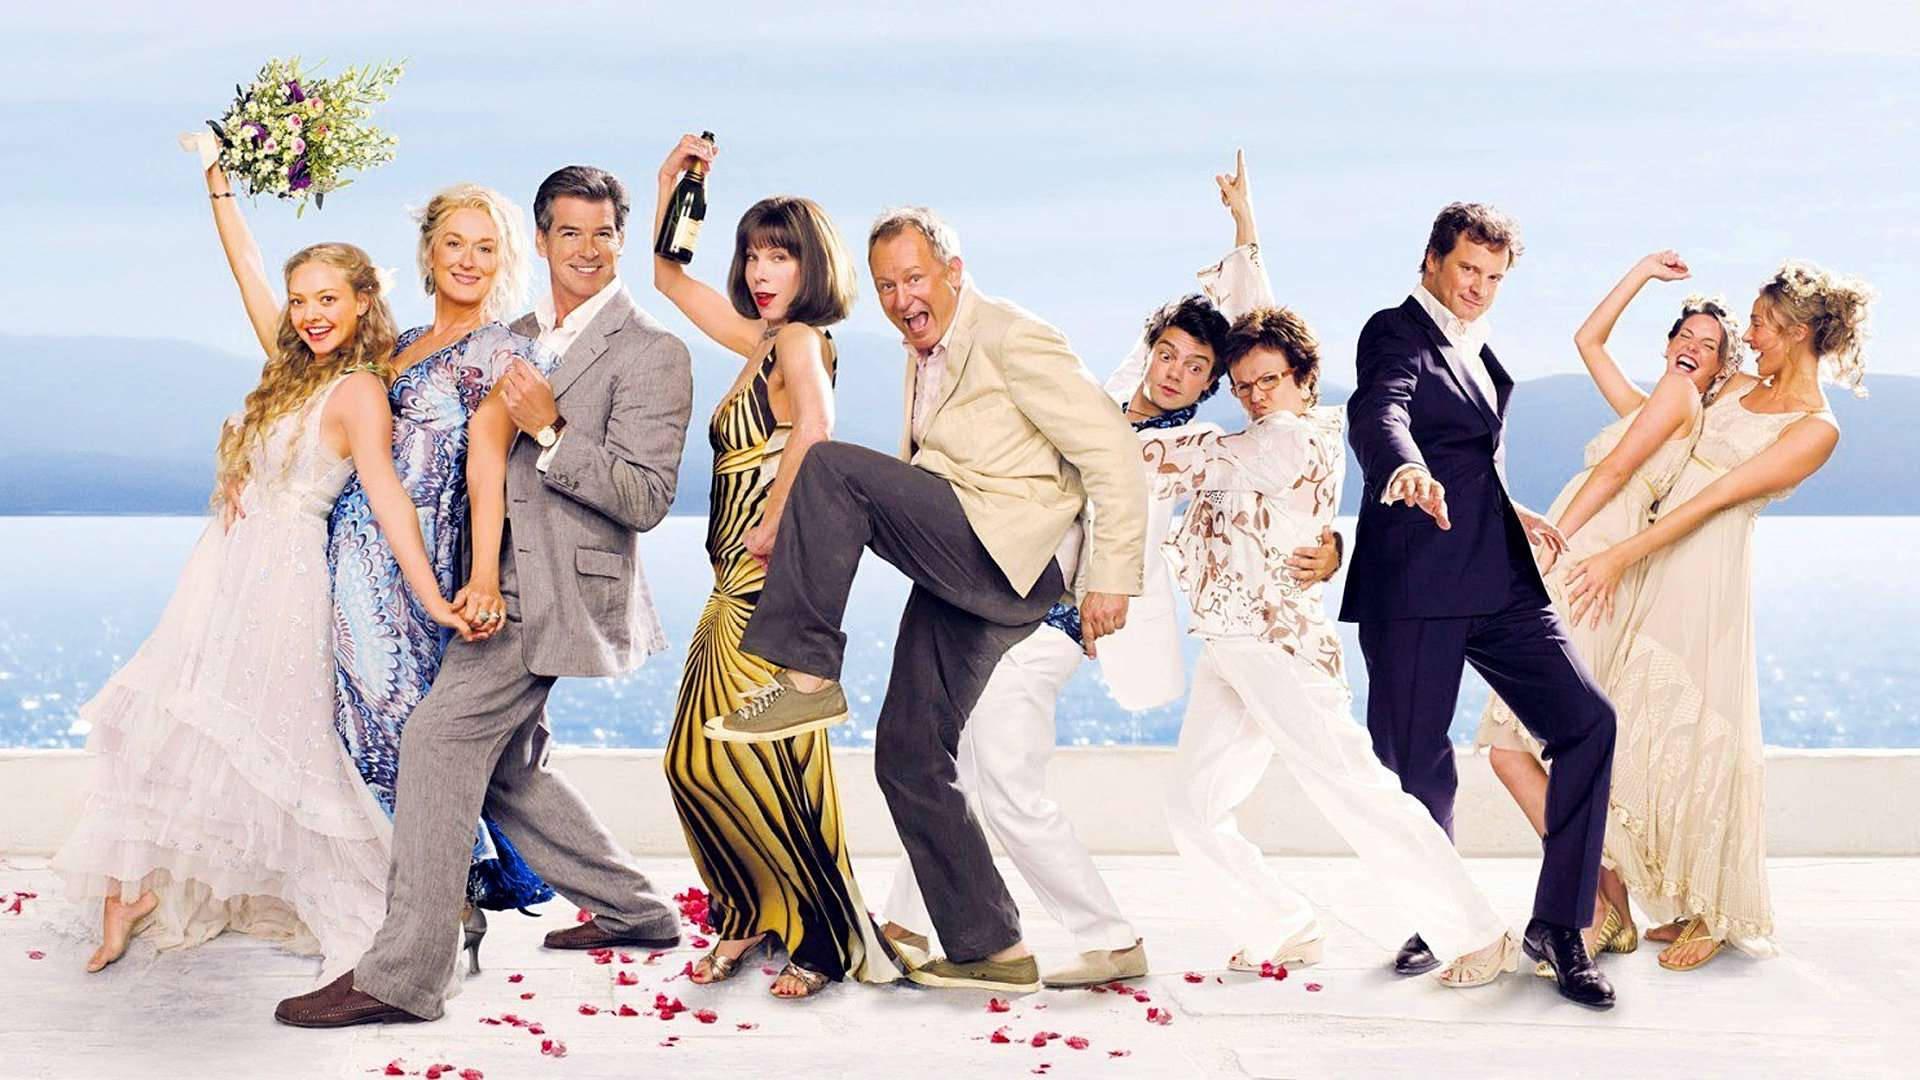 wedding not dating cast